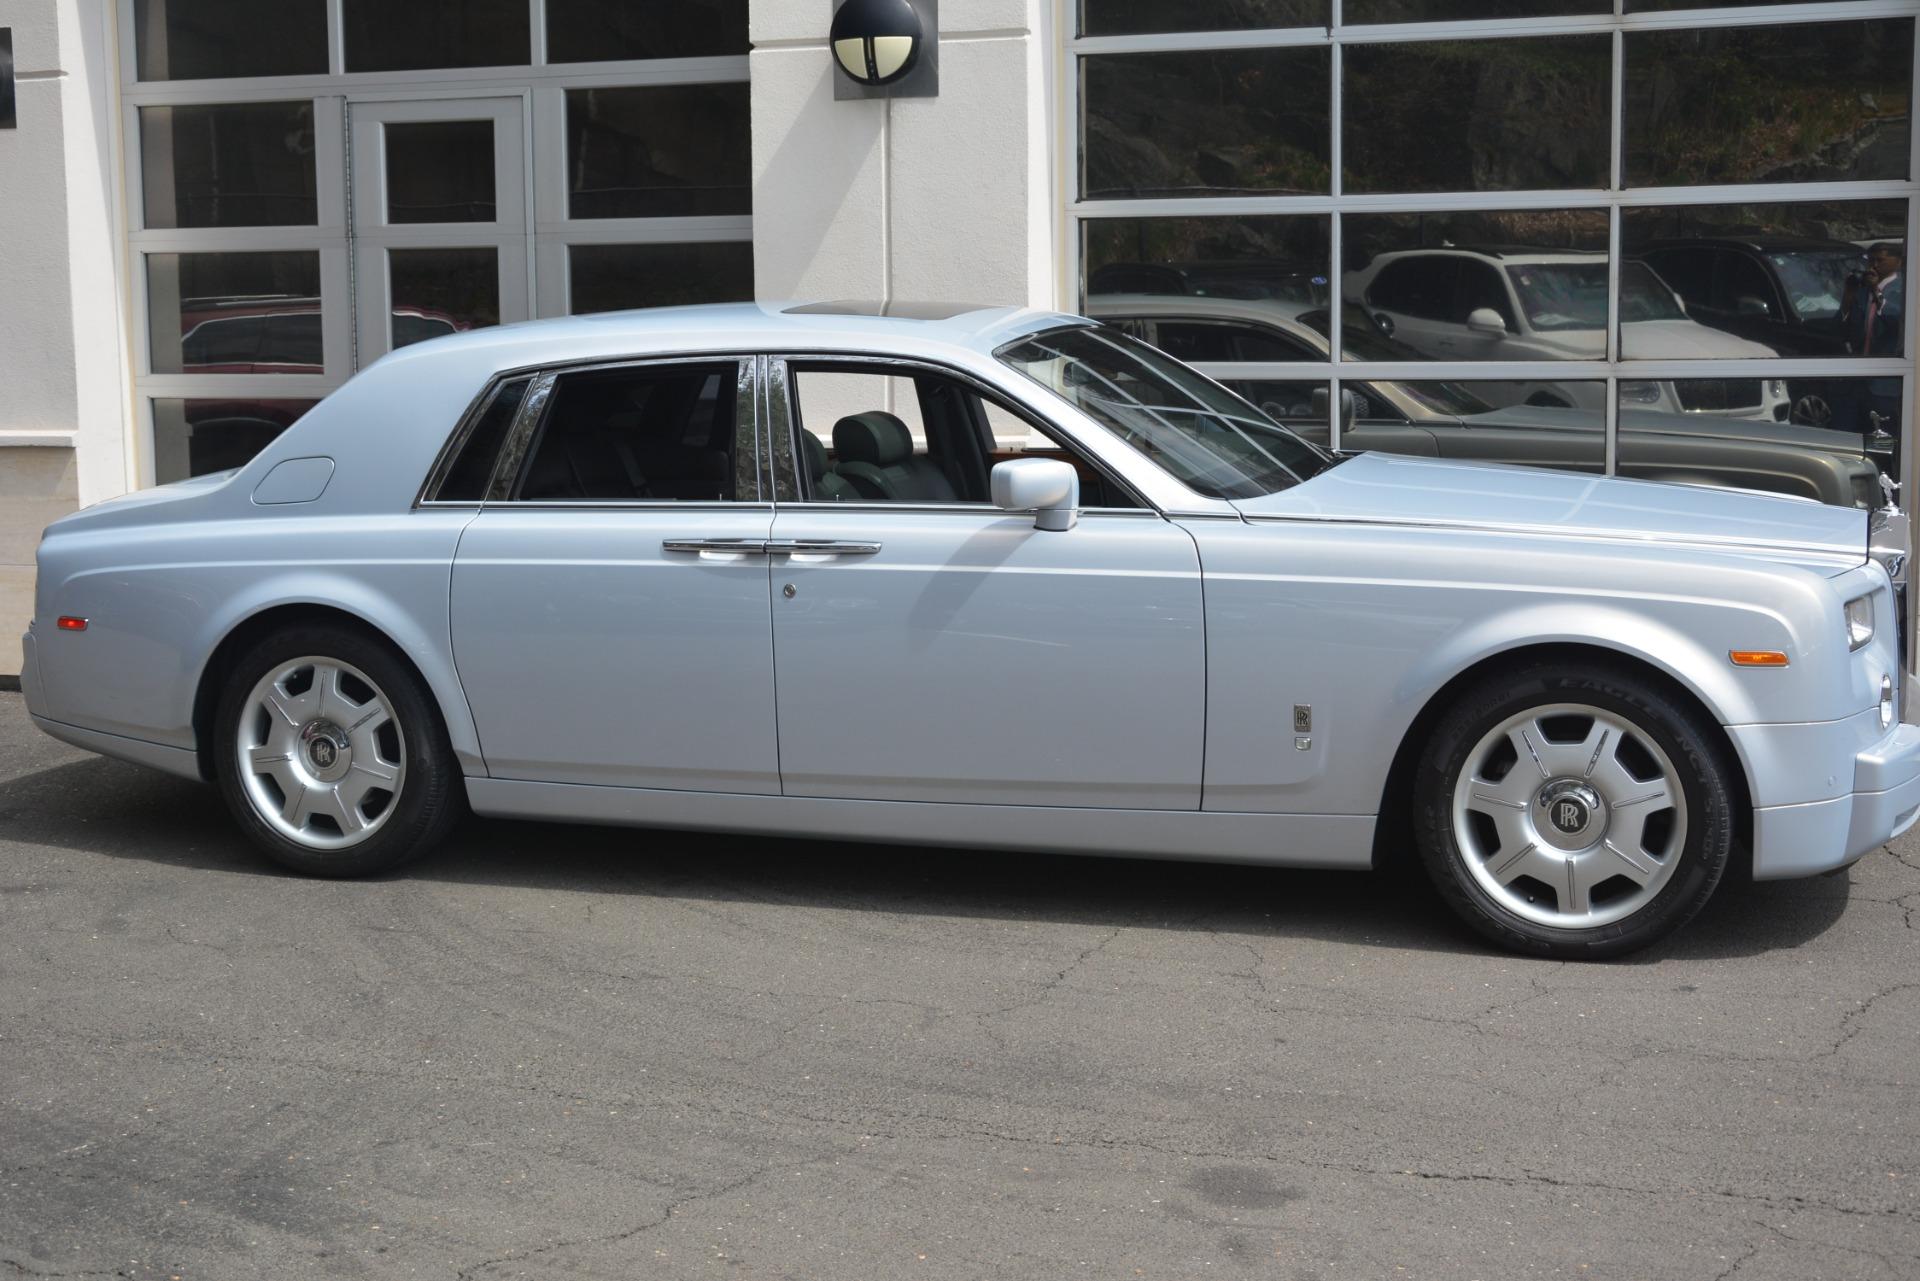 Used 2007 Rolls-Royce Phantom  For Sale In Greenwich, CT 3089_p10